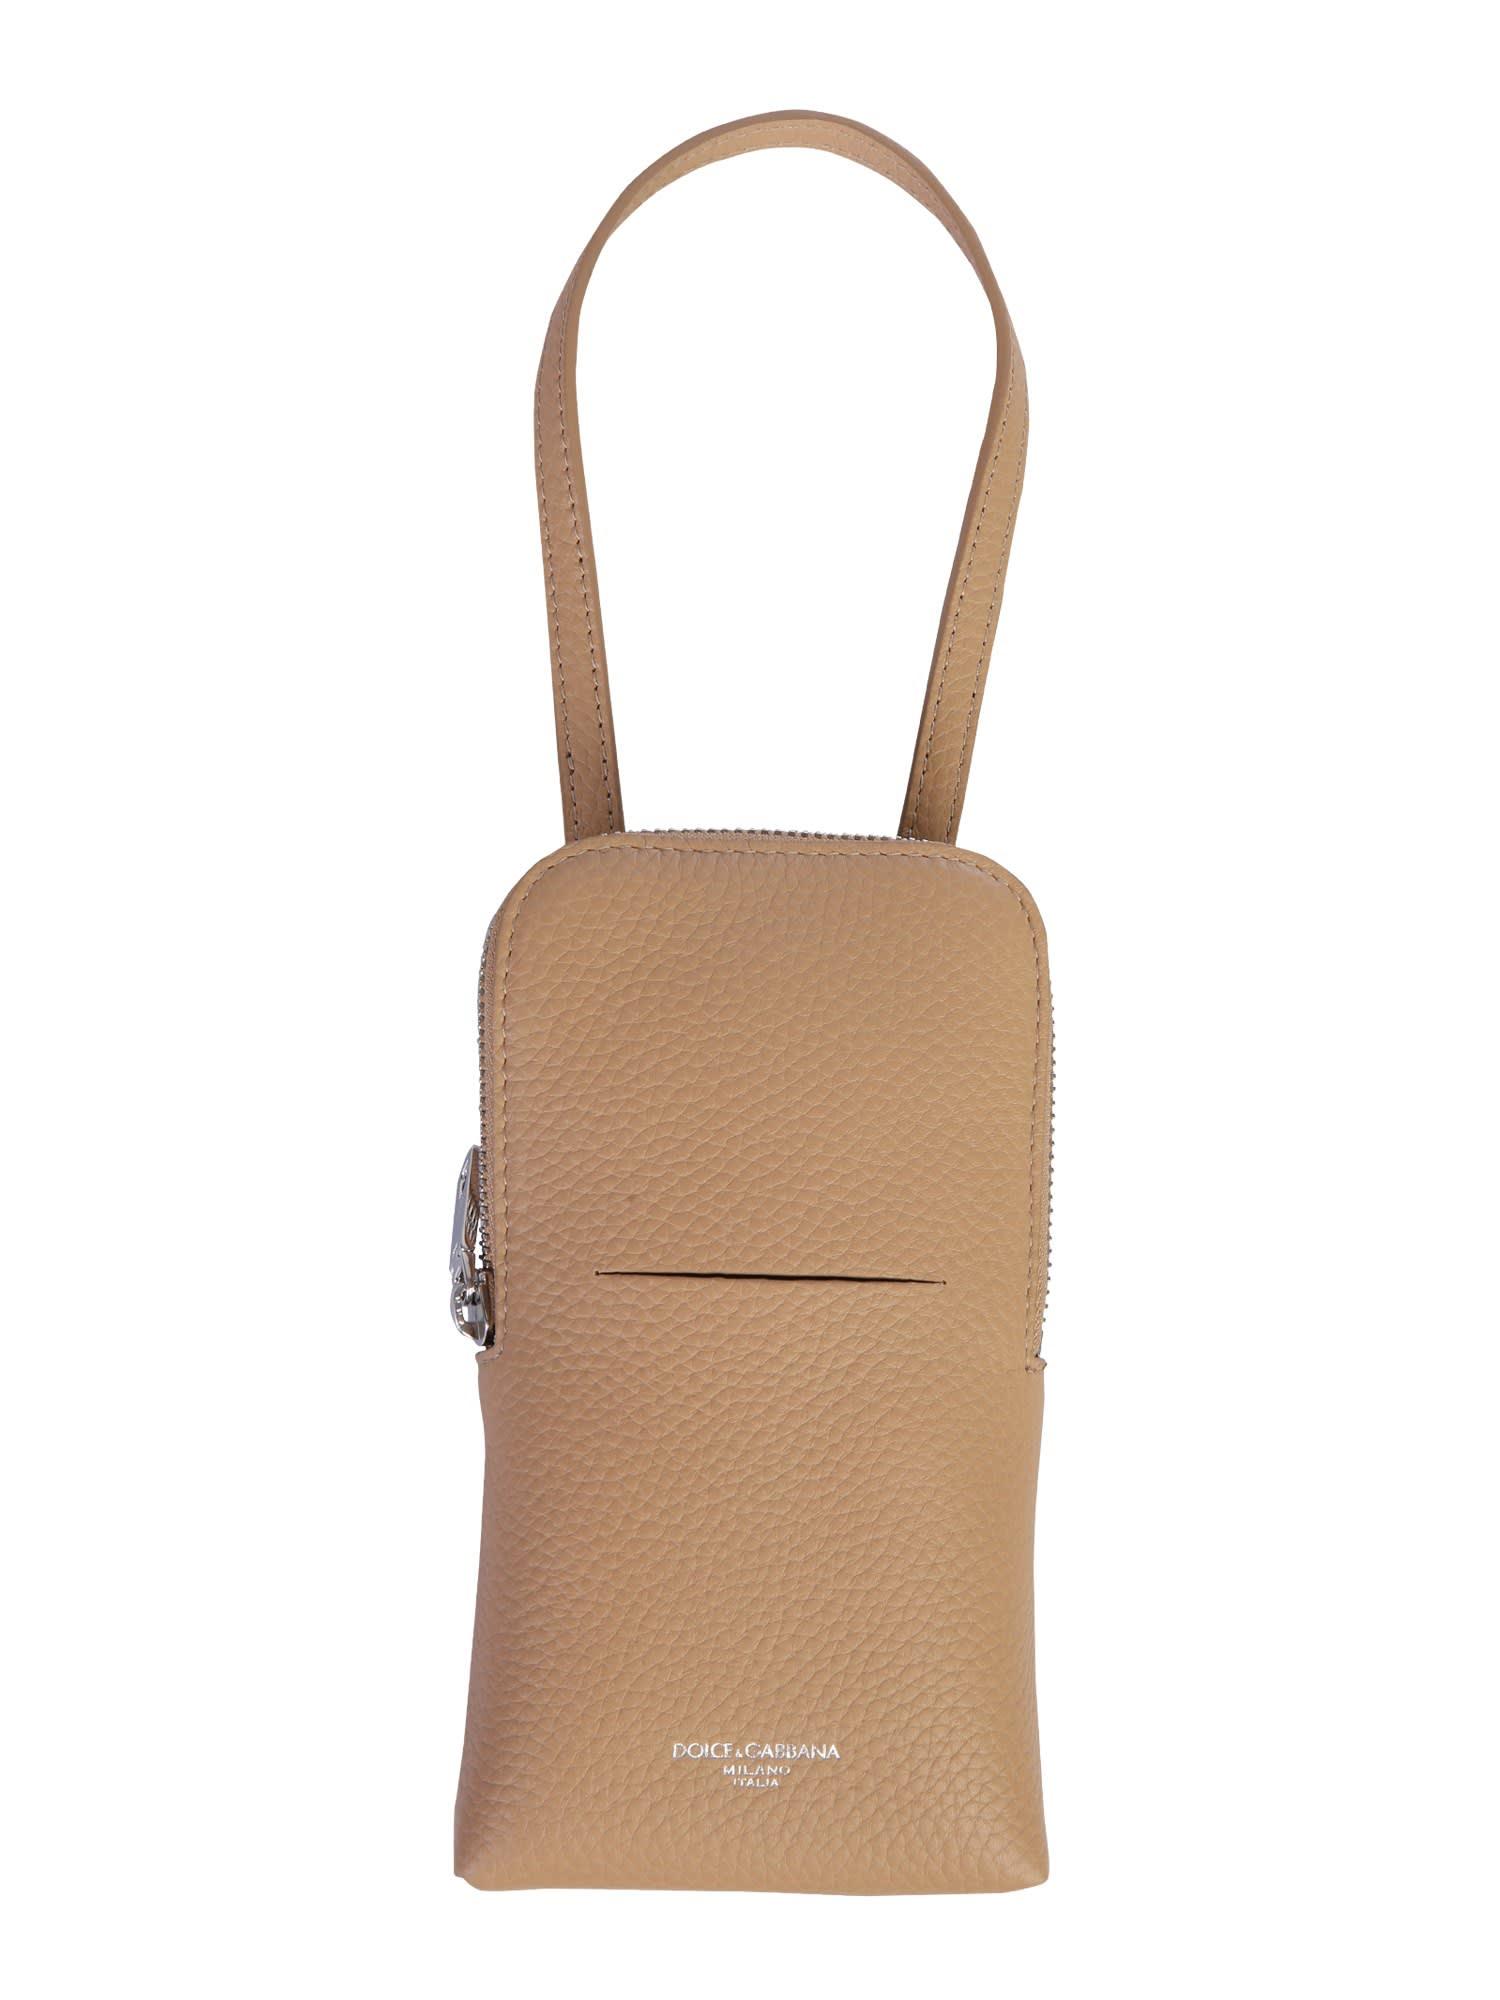 Dolce & Gabbana Smartphone Case With Logo